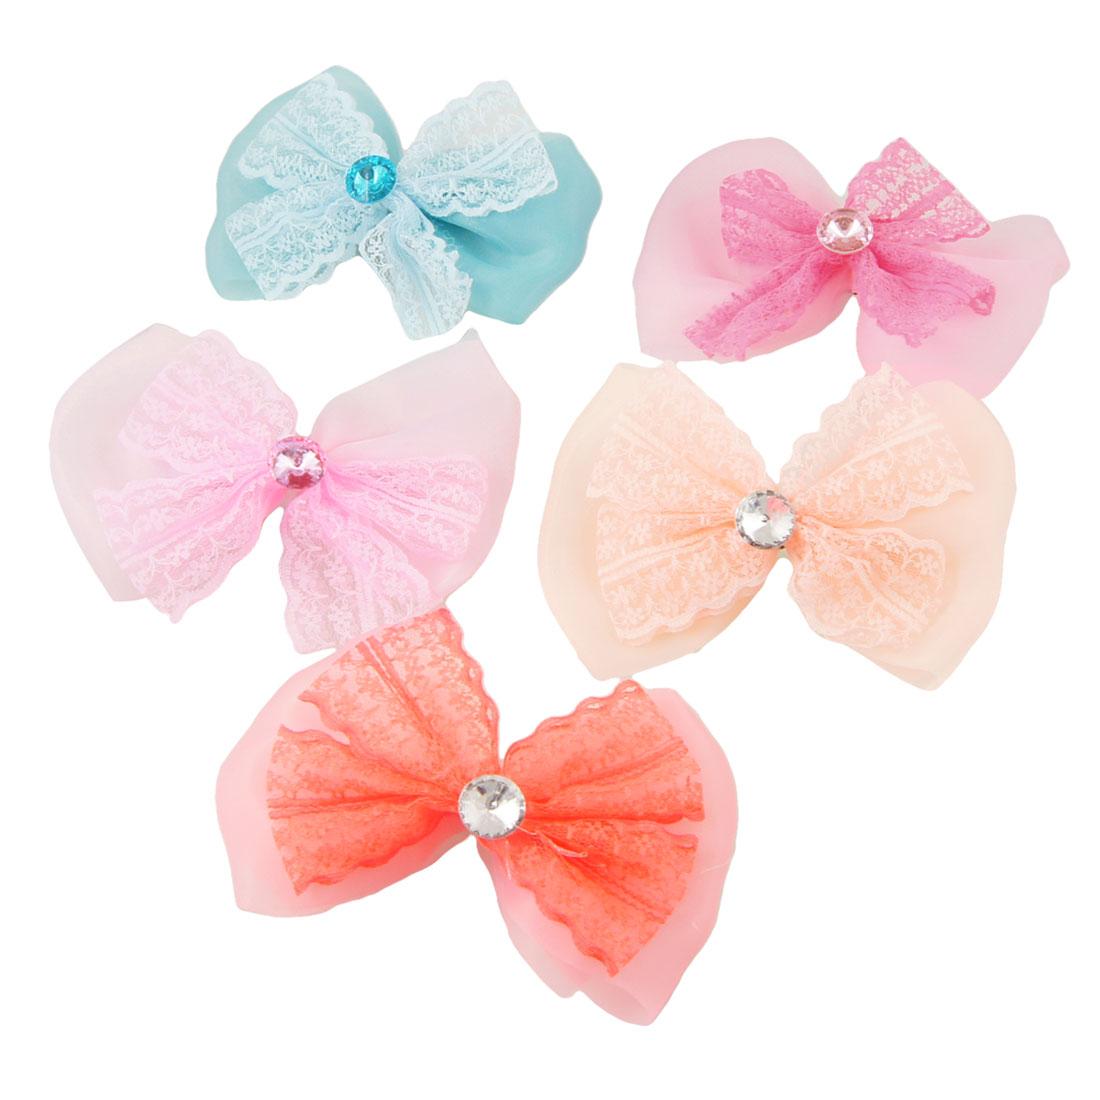 5 Pcs Rhinestone Accent Colorful Organza Lace Bowknot Hairclips